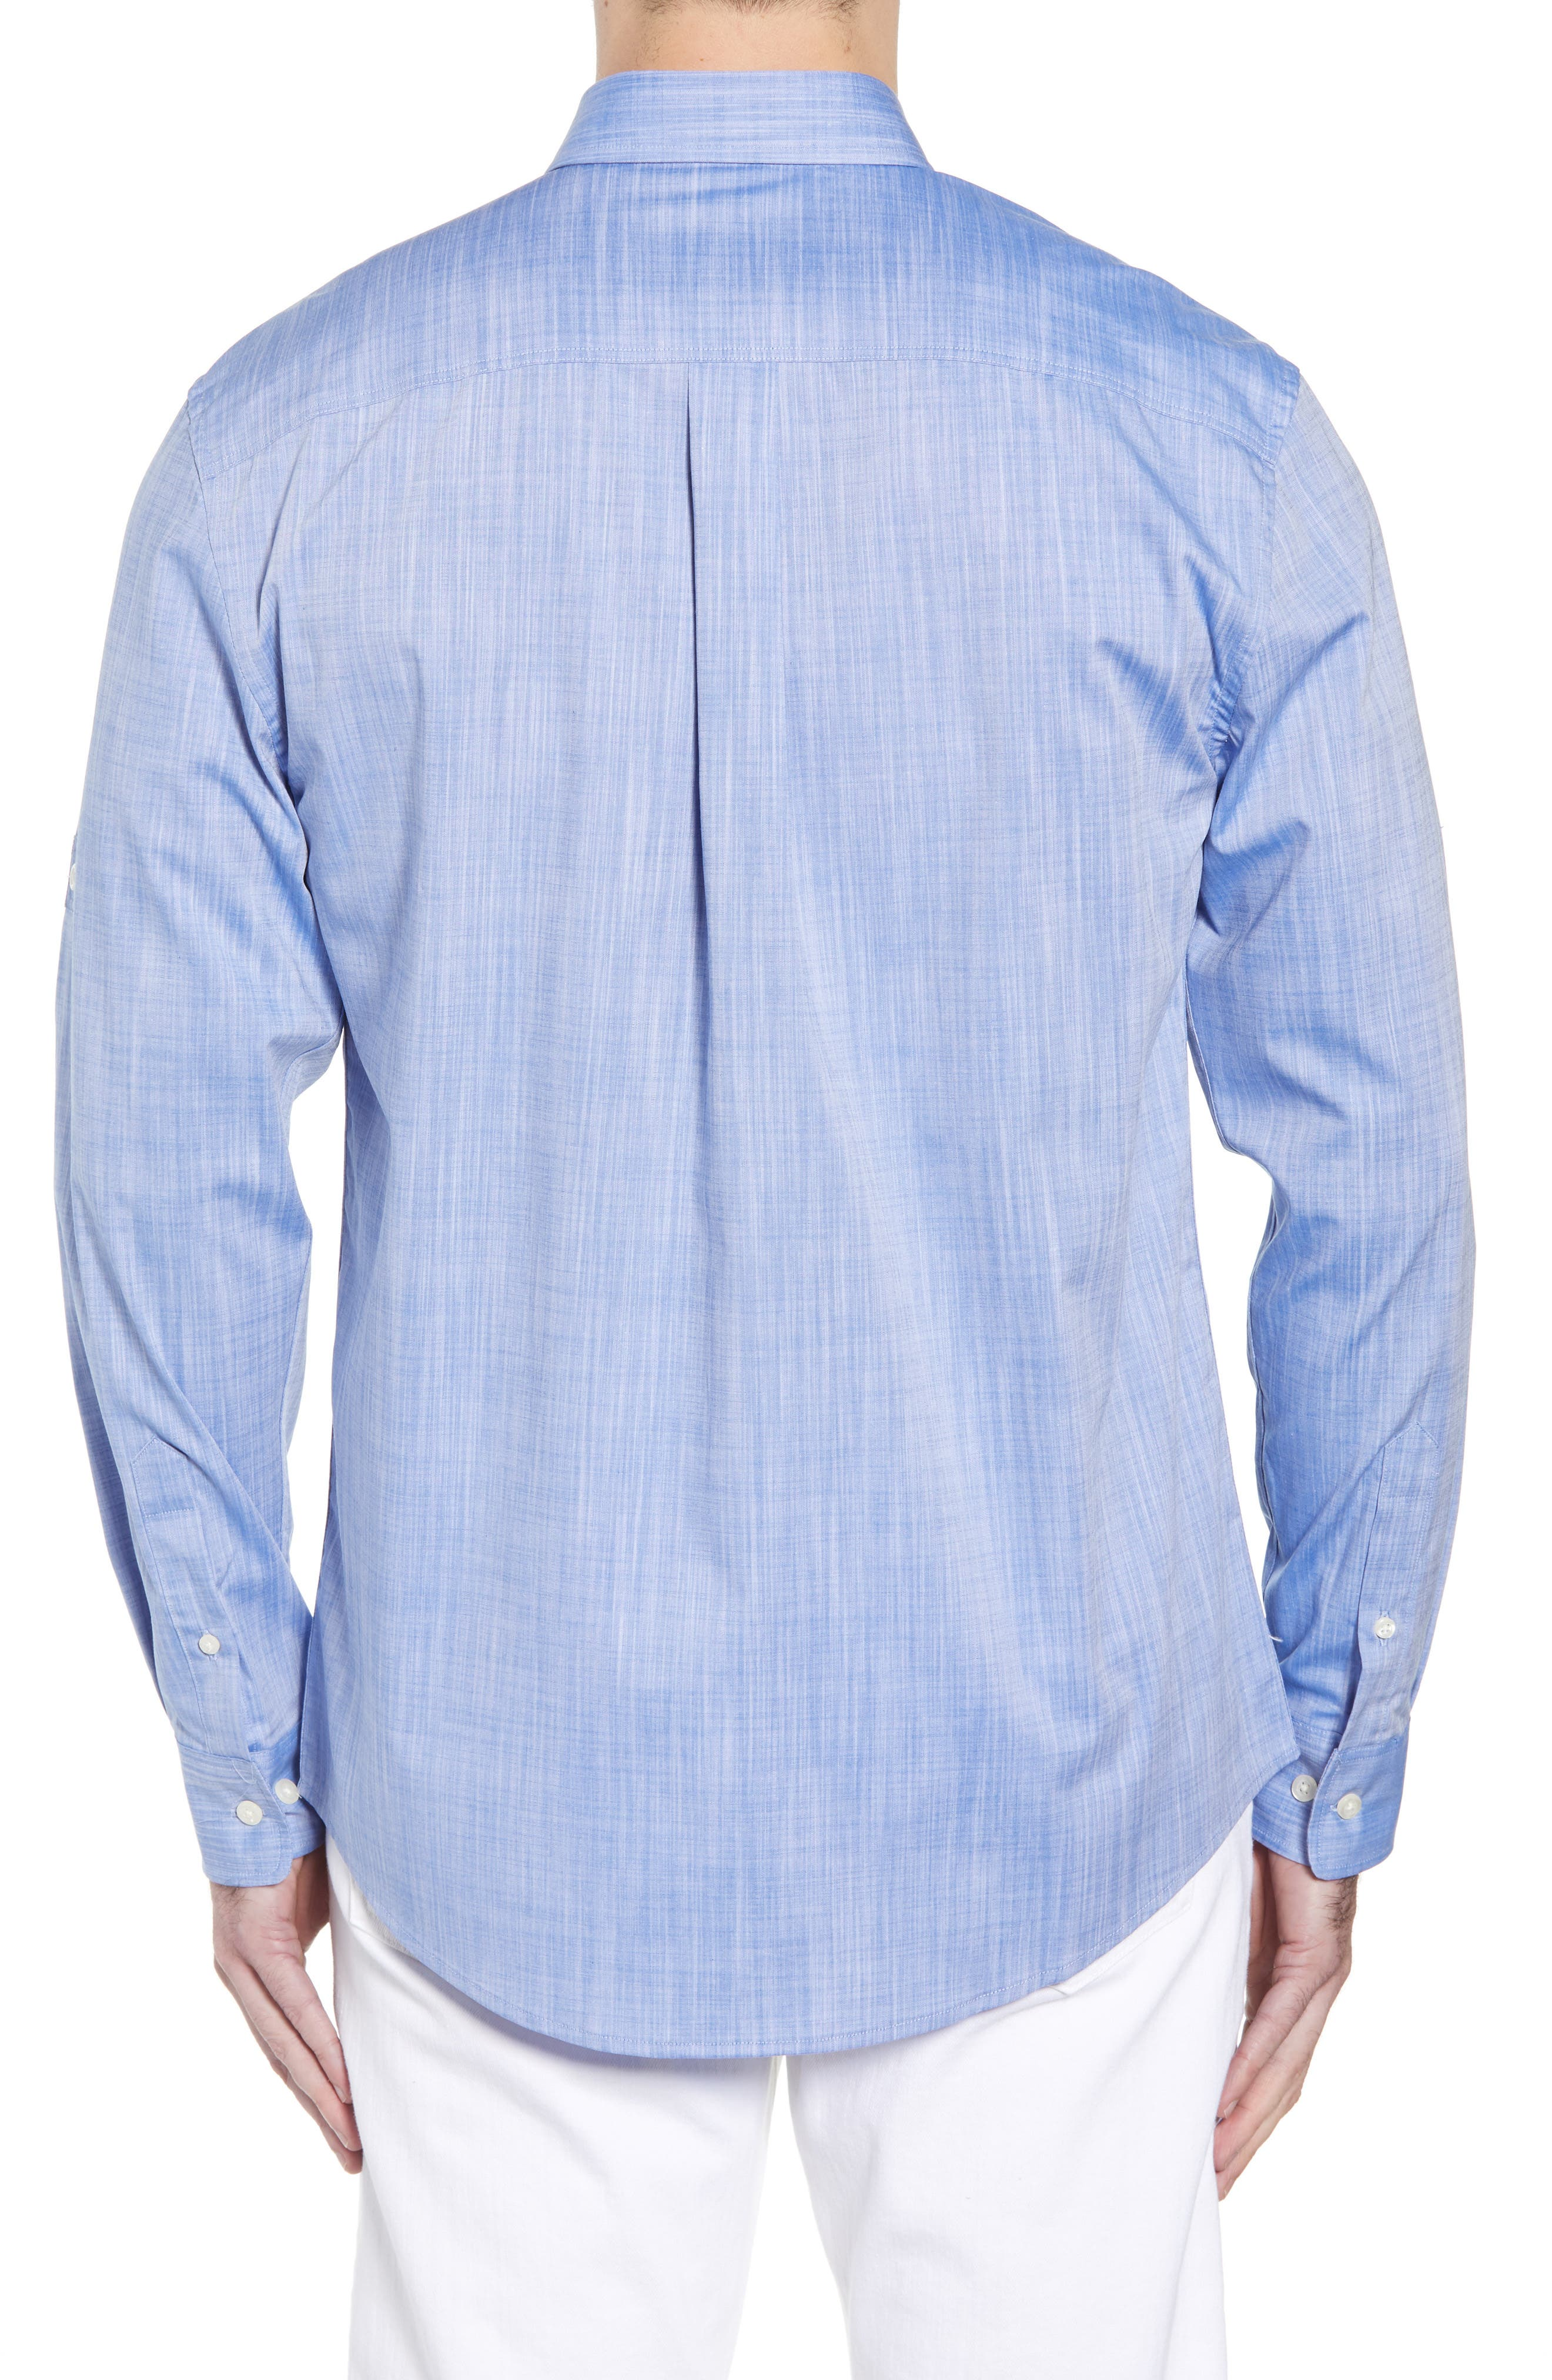 Hutton Classic Fit Shirt,                             Alternate thumbnail 3, color,                             Deep Water